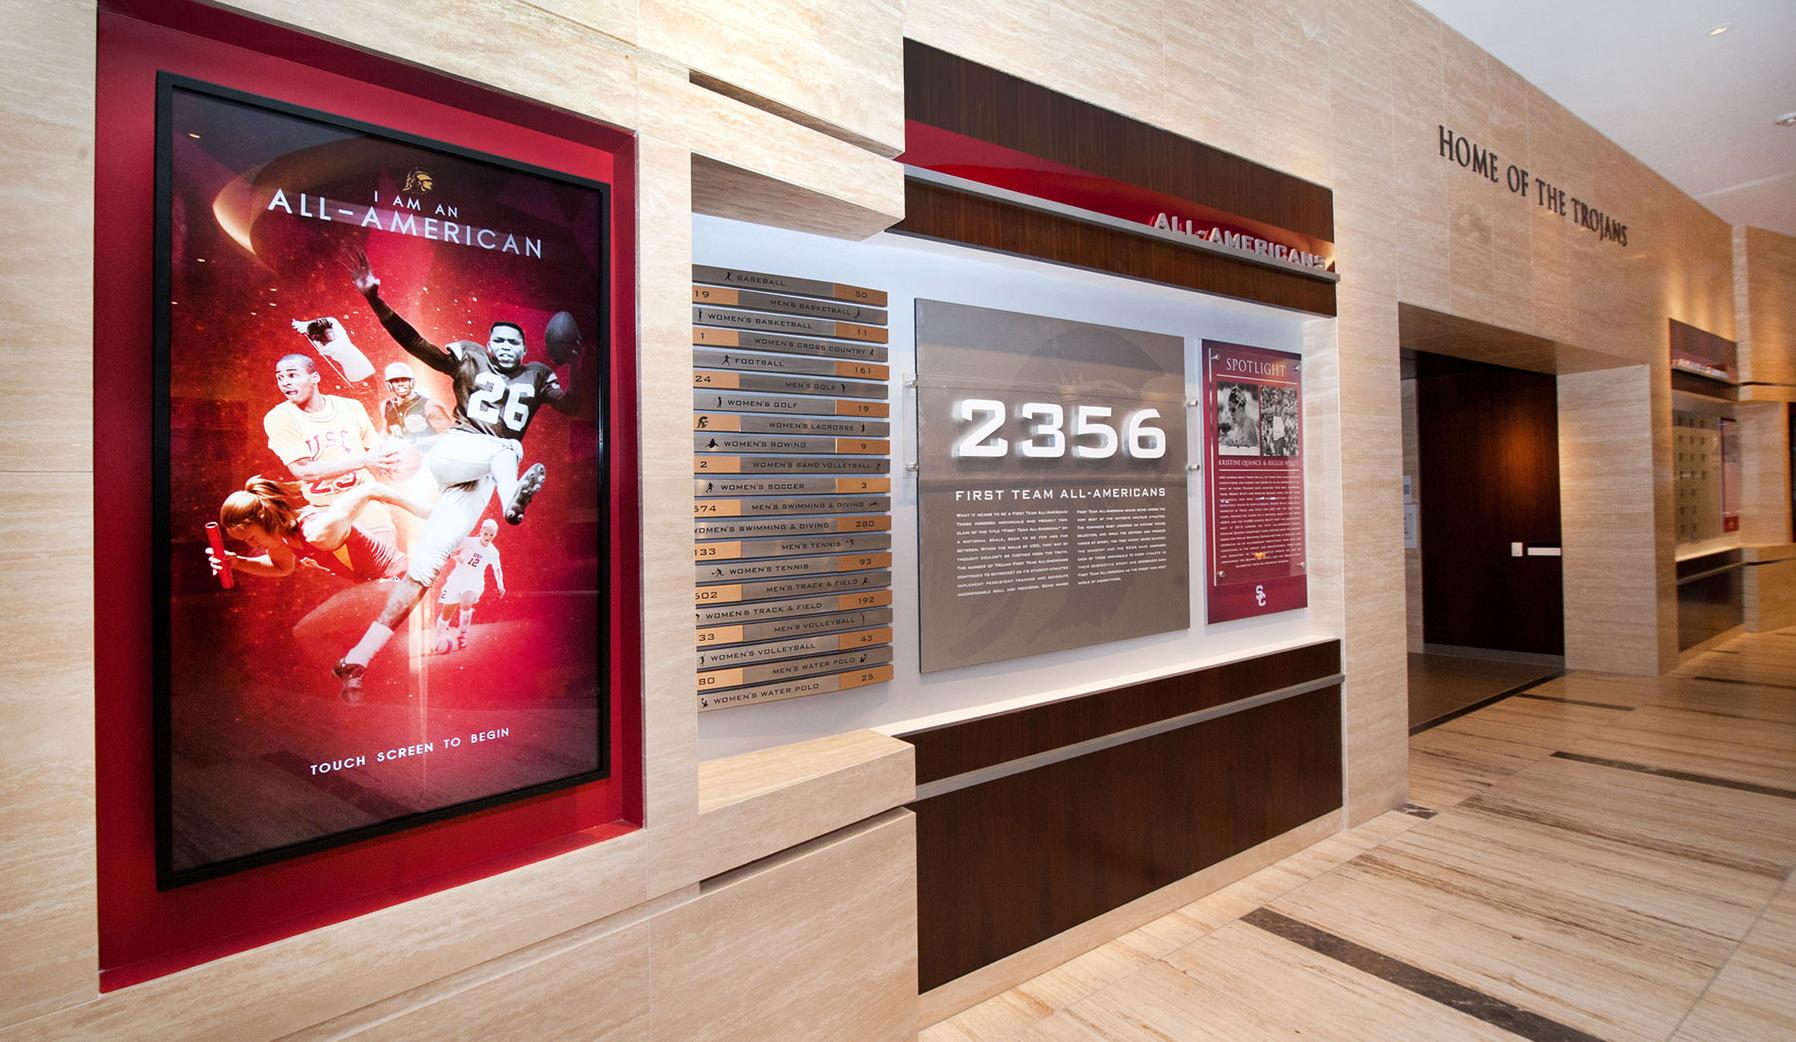 Heritage Hall Installation image: All American display